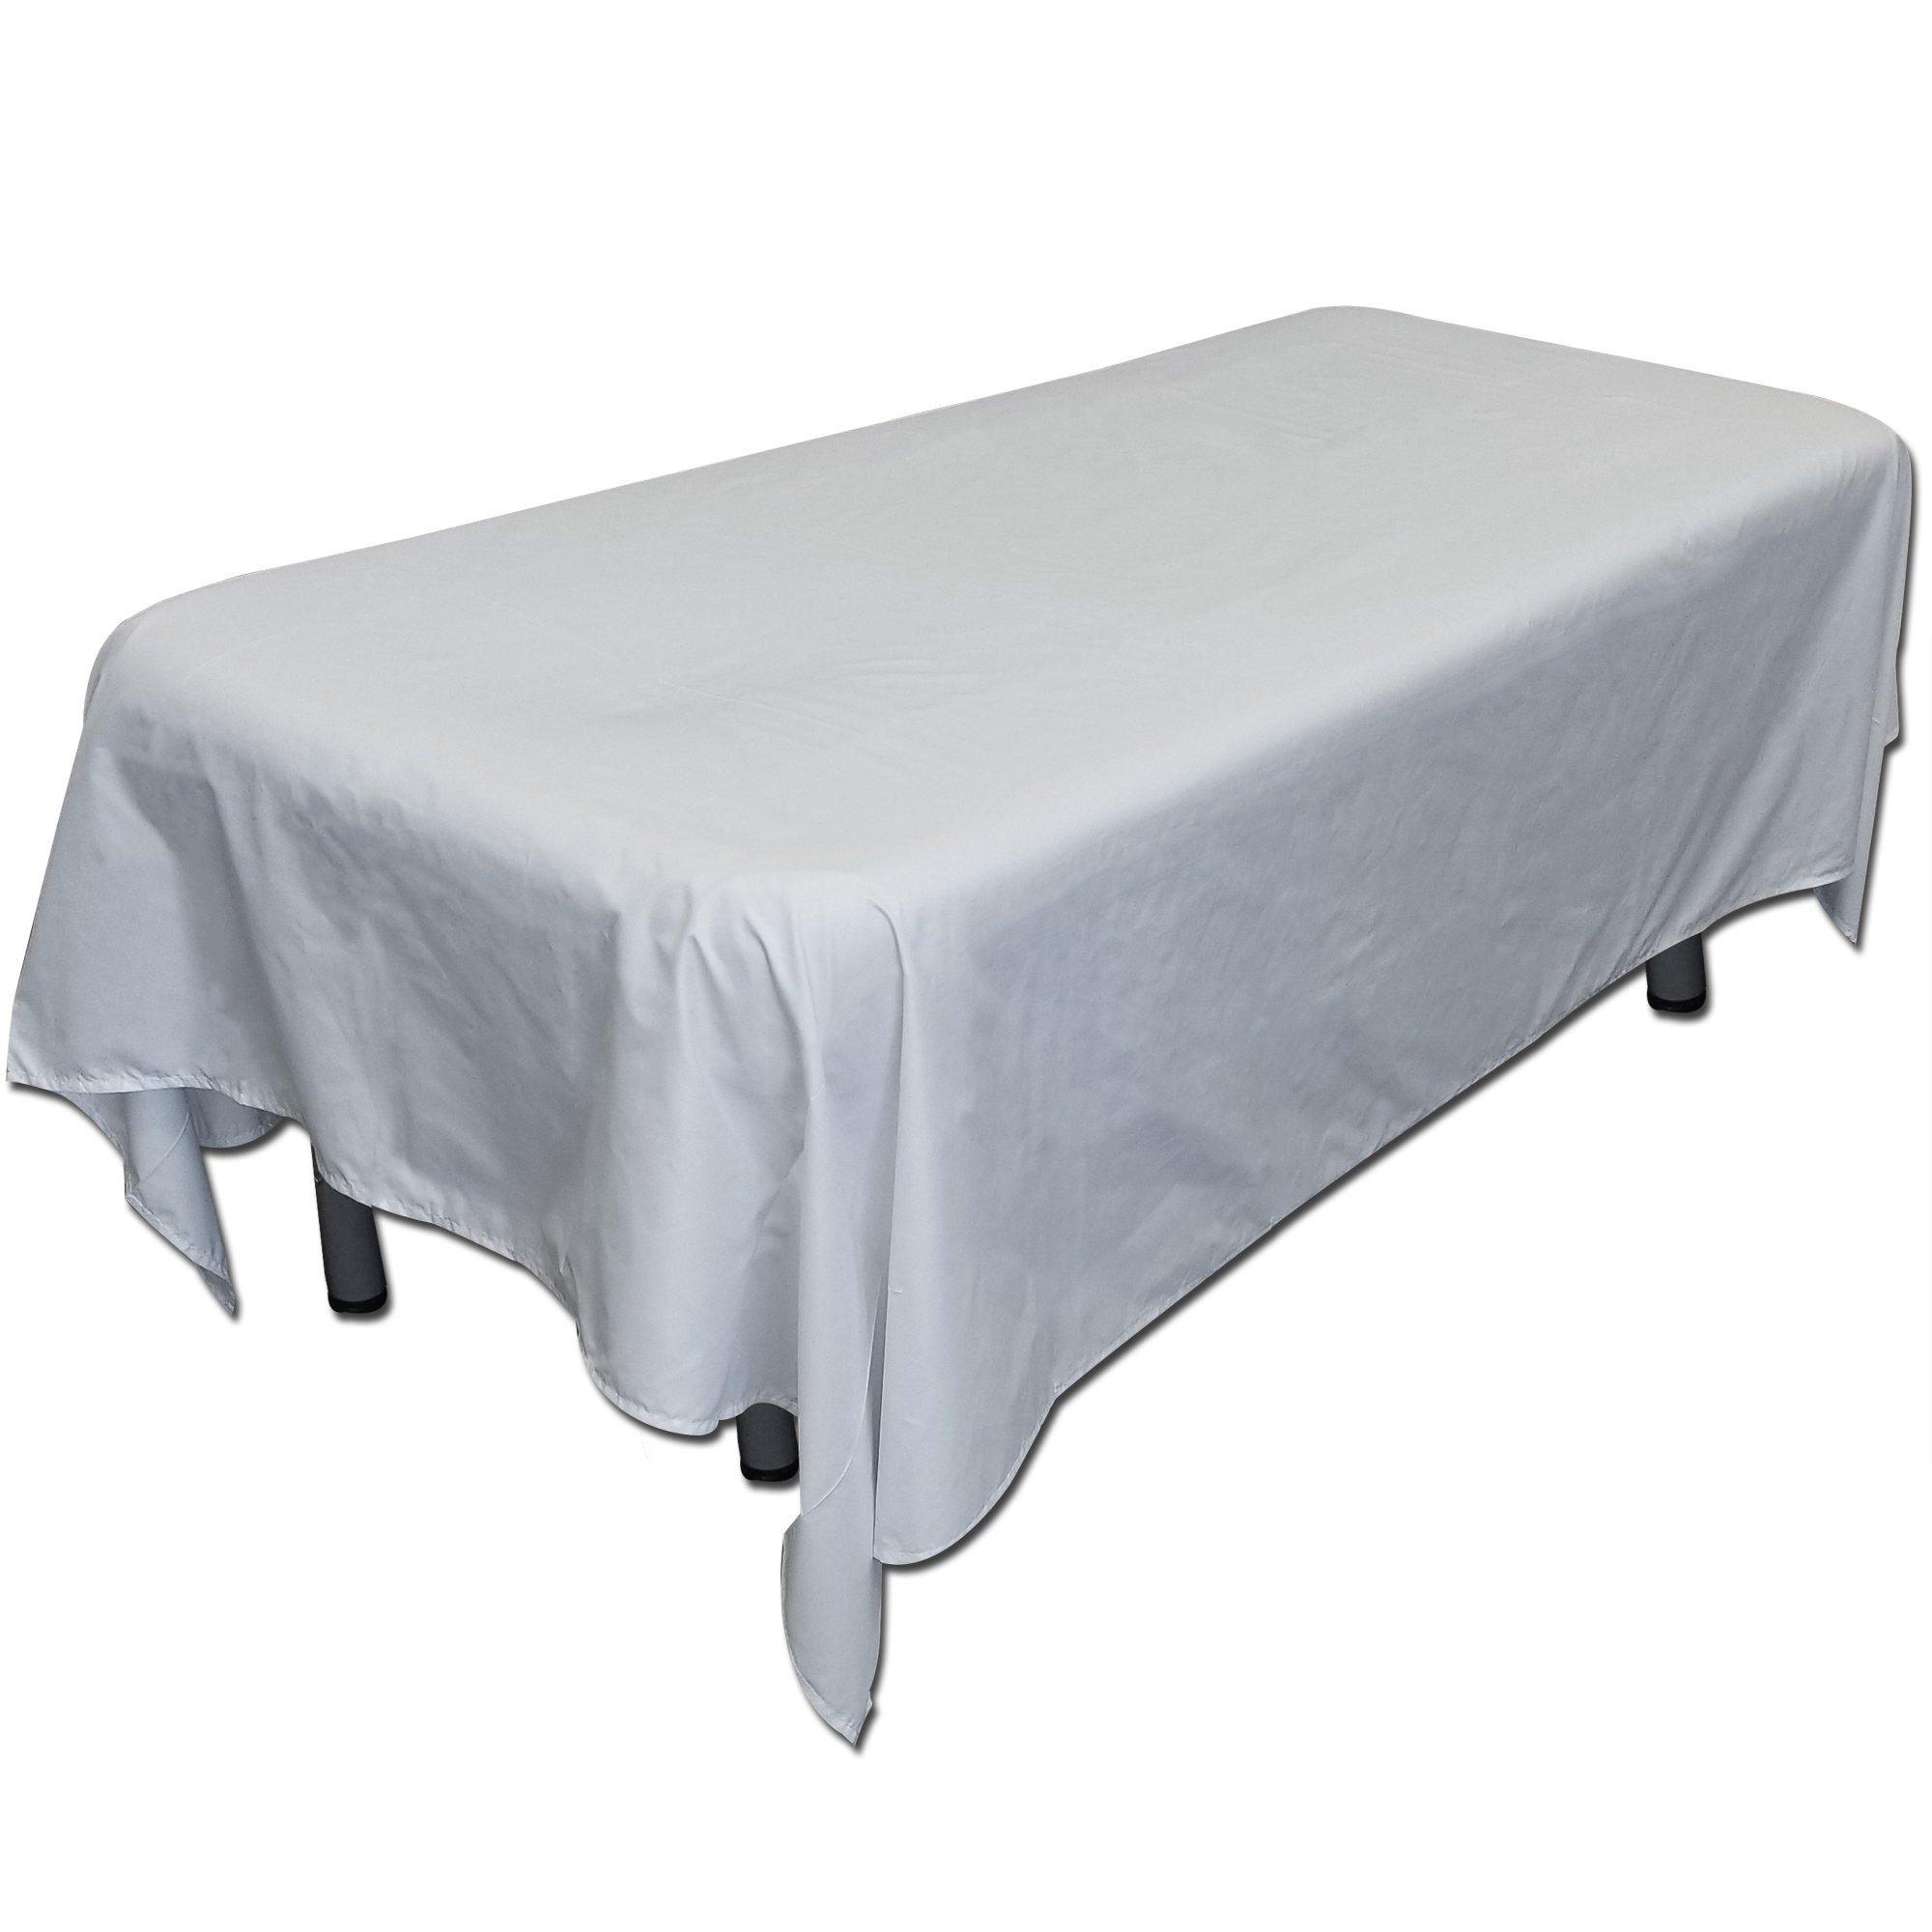 TOA 6pc/pkg Large Comfort Flat Sheets Washable Reusable Massage Table Cover